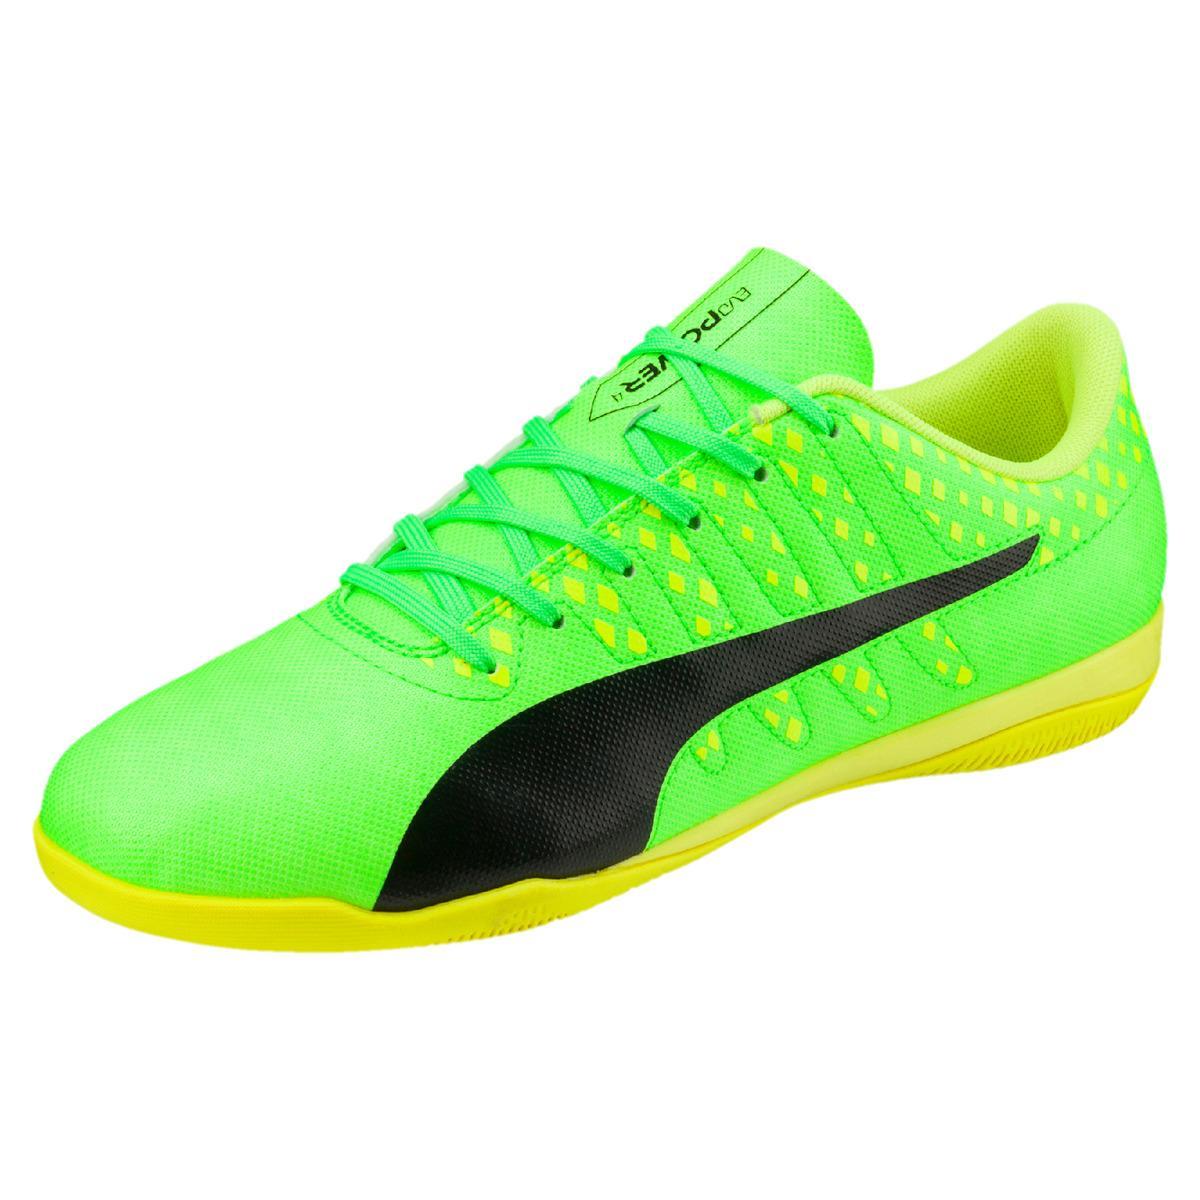 Puma Evopower Vigor 4 It Indoor Football Boots in Green ...